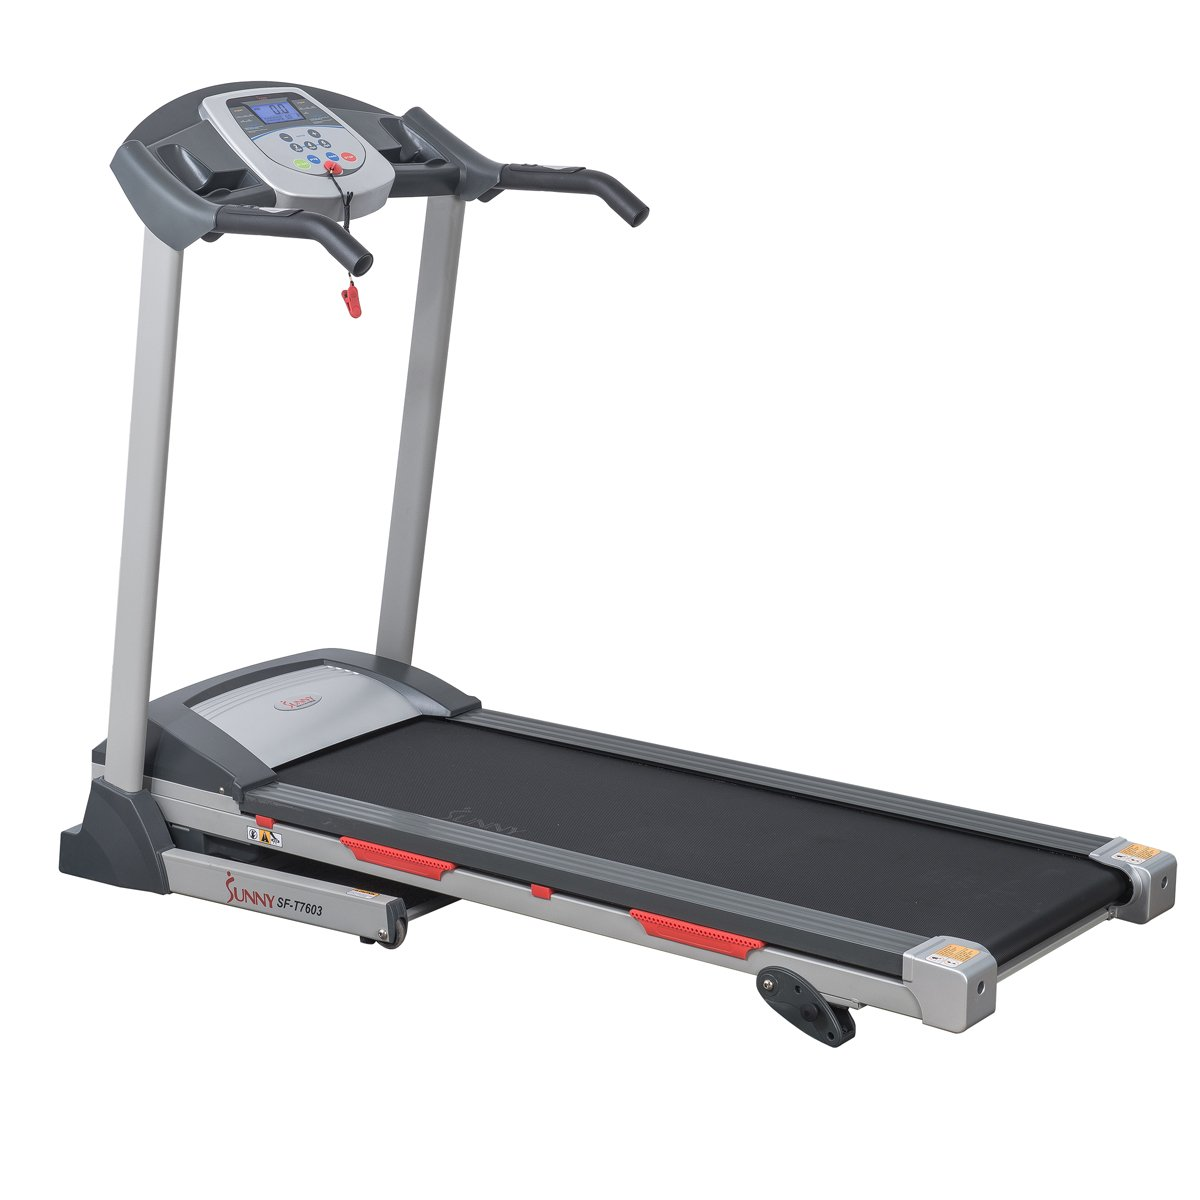 Treadmill for Seniors 3 Treadmill for Seniors